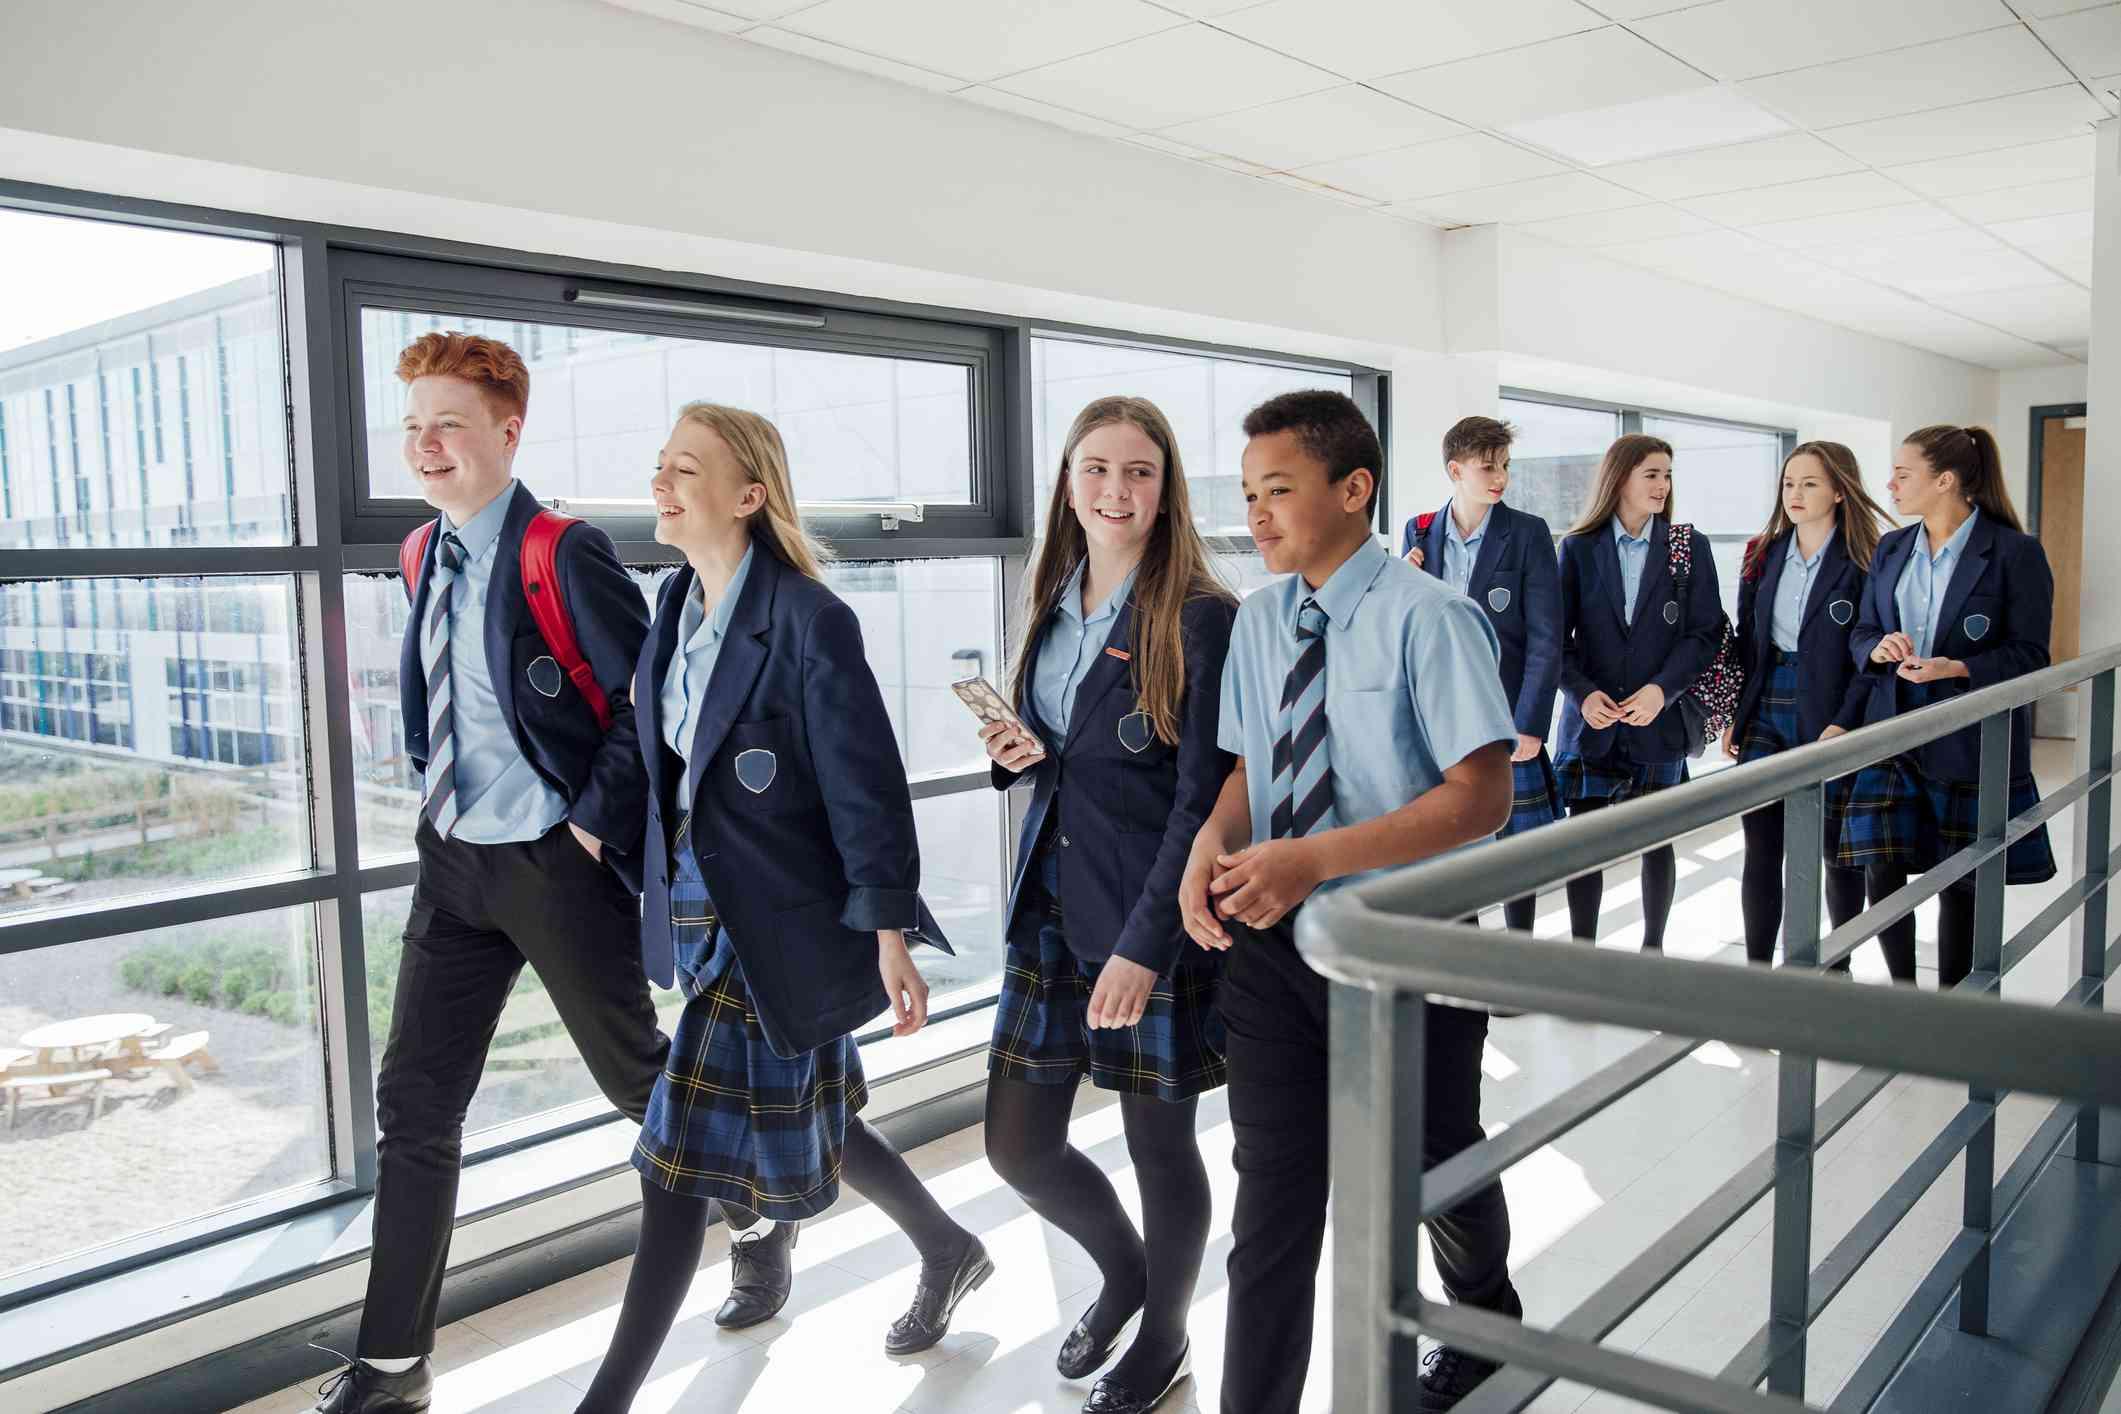 Students in private school uniforms